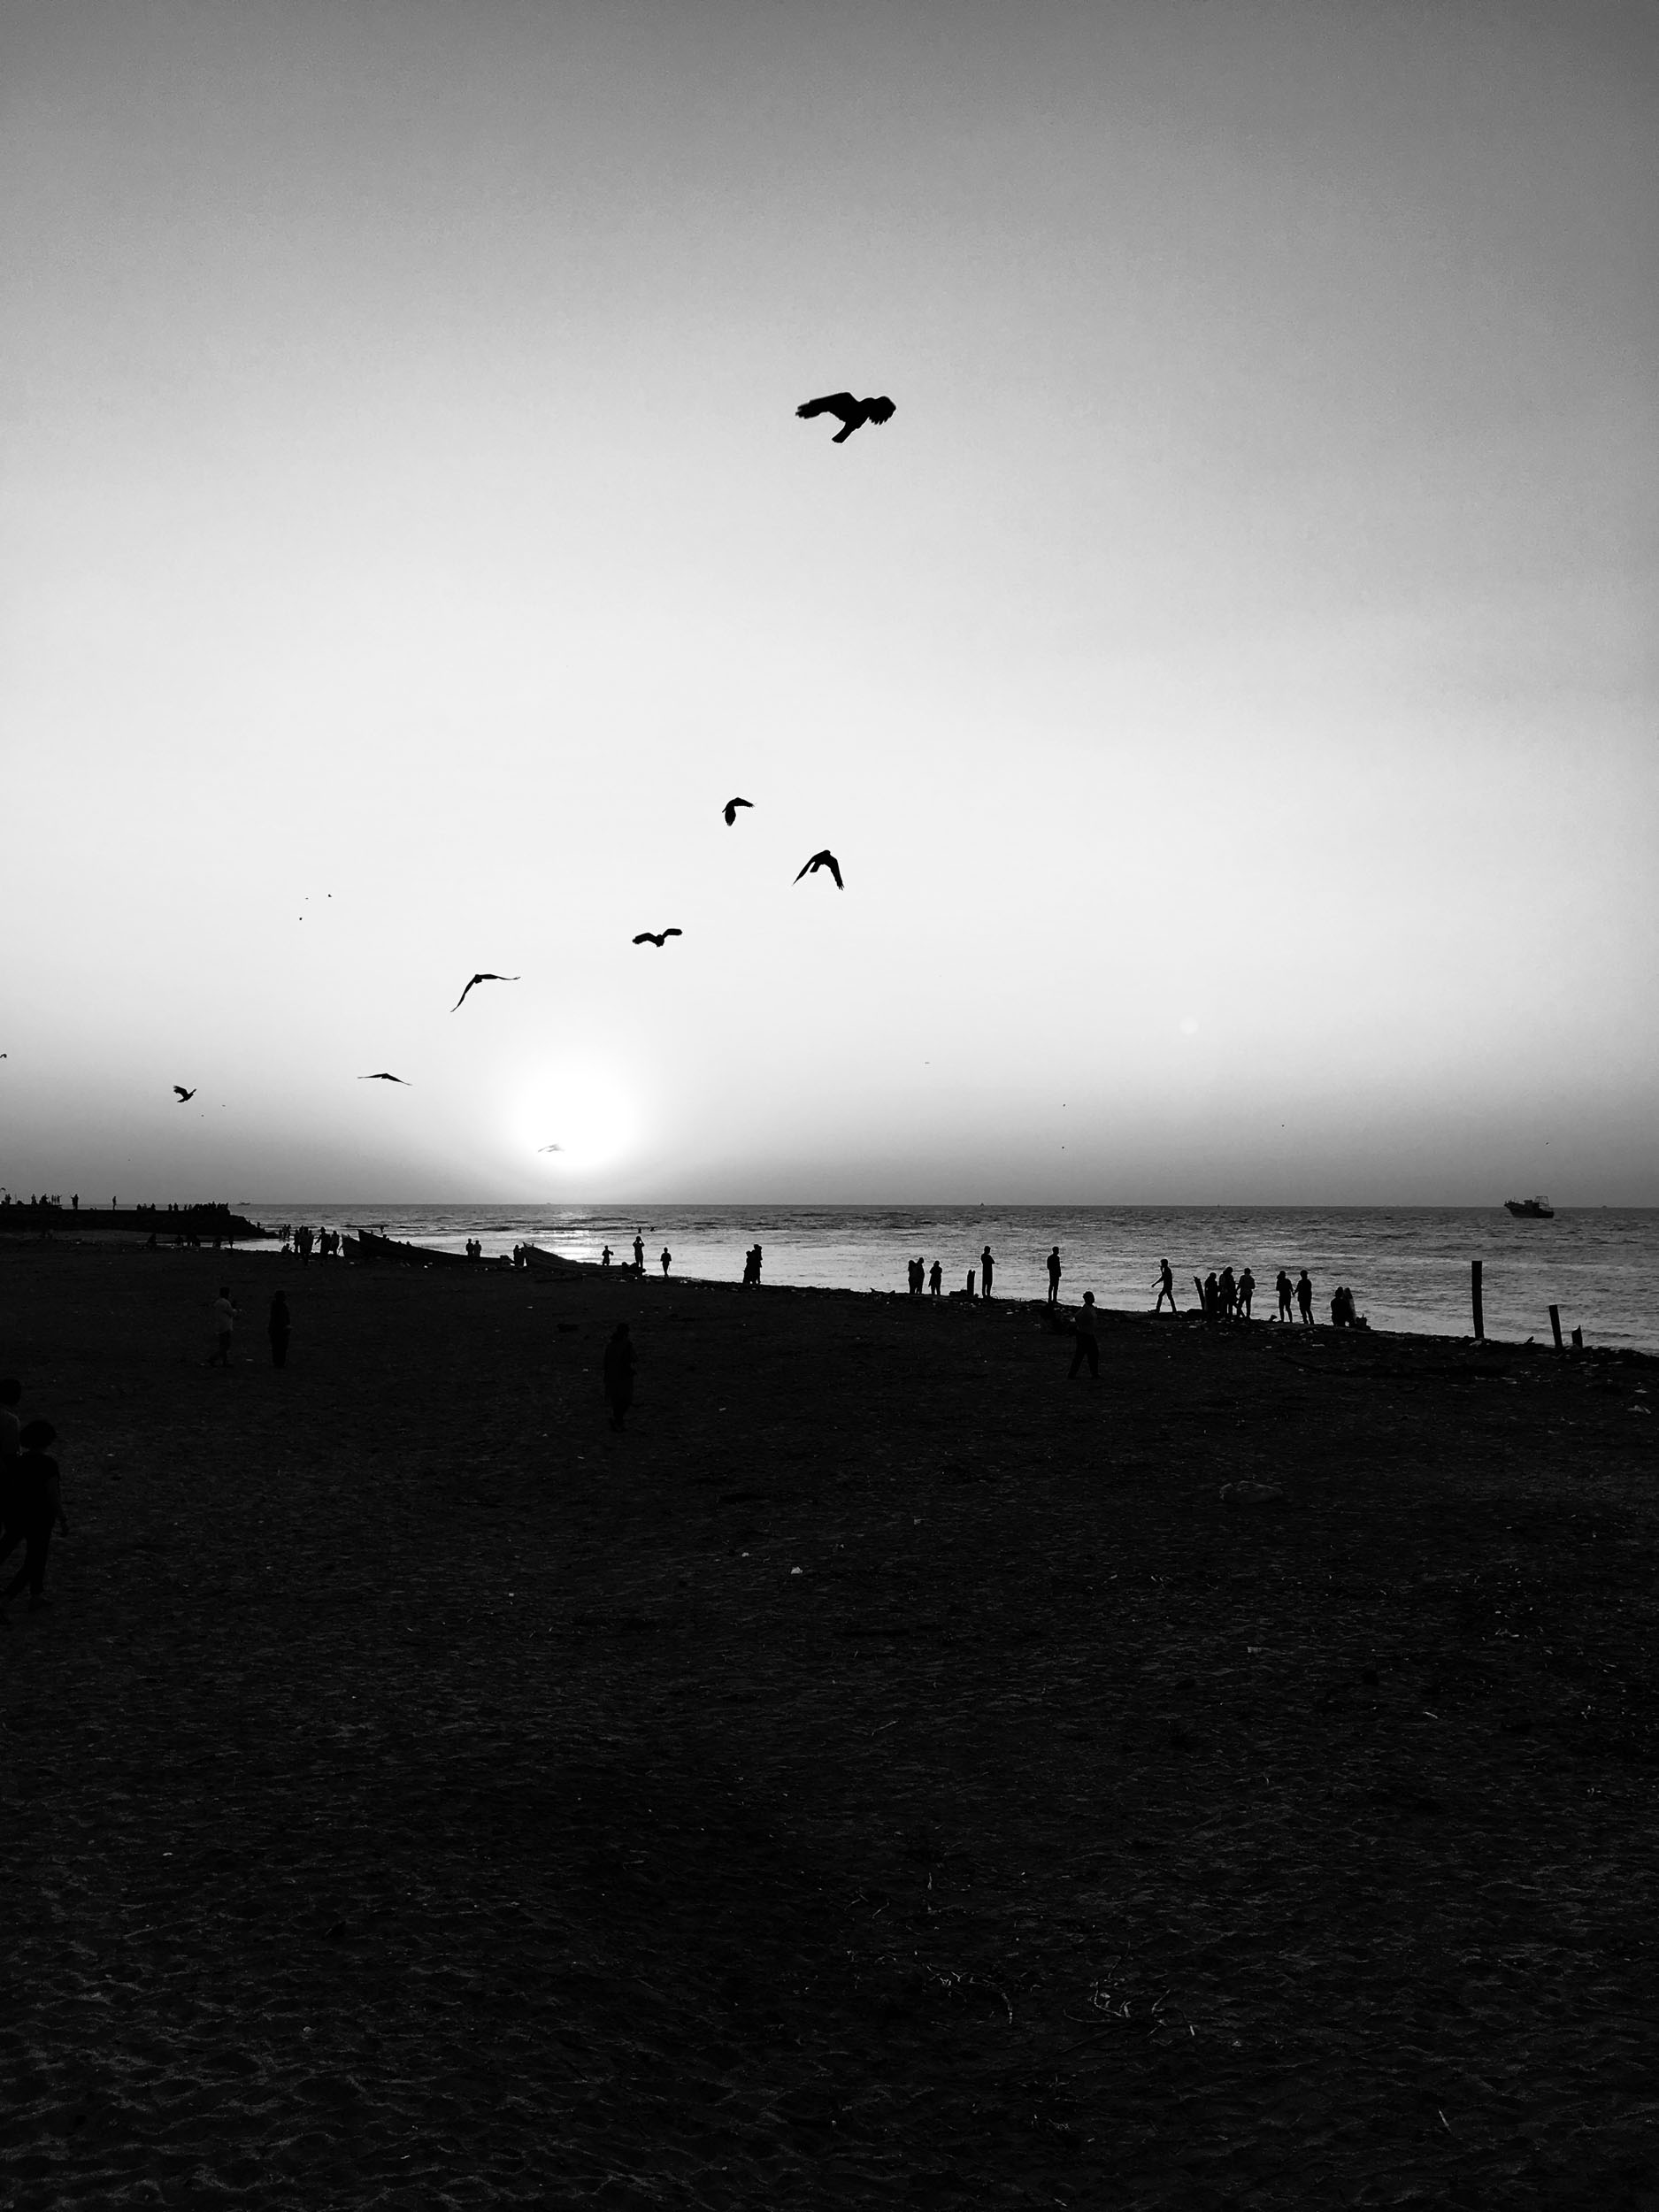 Sindhur_Photography_Kochi Muziris Biennale -2019-58.JPG